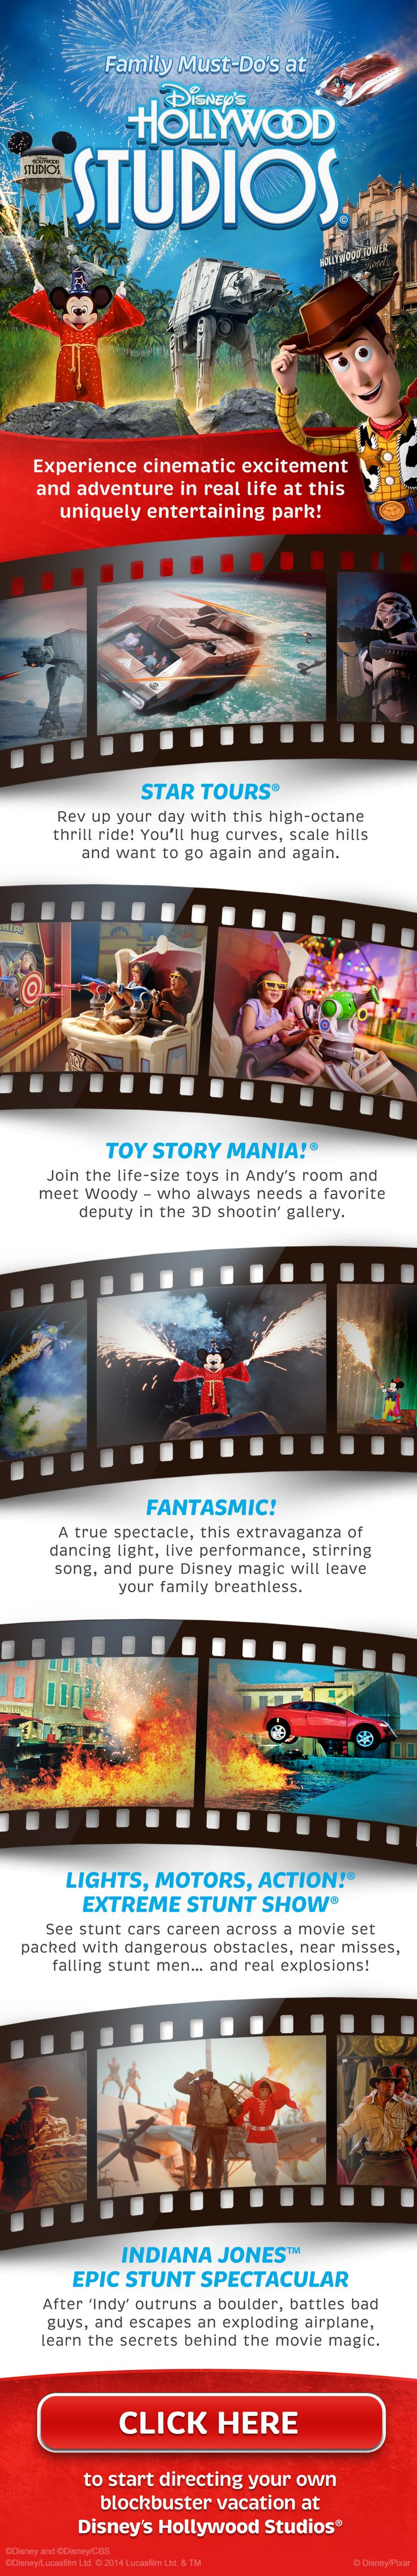 Family Must-Do's at Disney's Hollywood Studios! Star Wars, Toy Story, Fantasmic starring Mickey Mouse, Indiana Jones! #WaltDisneyWorld #vacation #tips #tricks